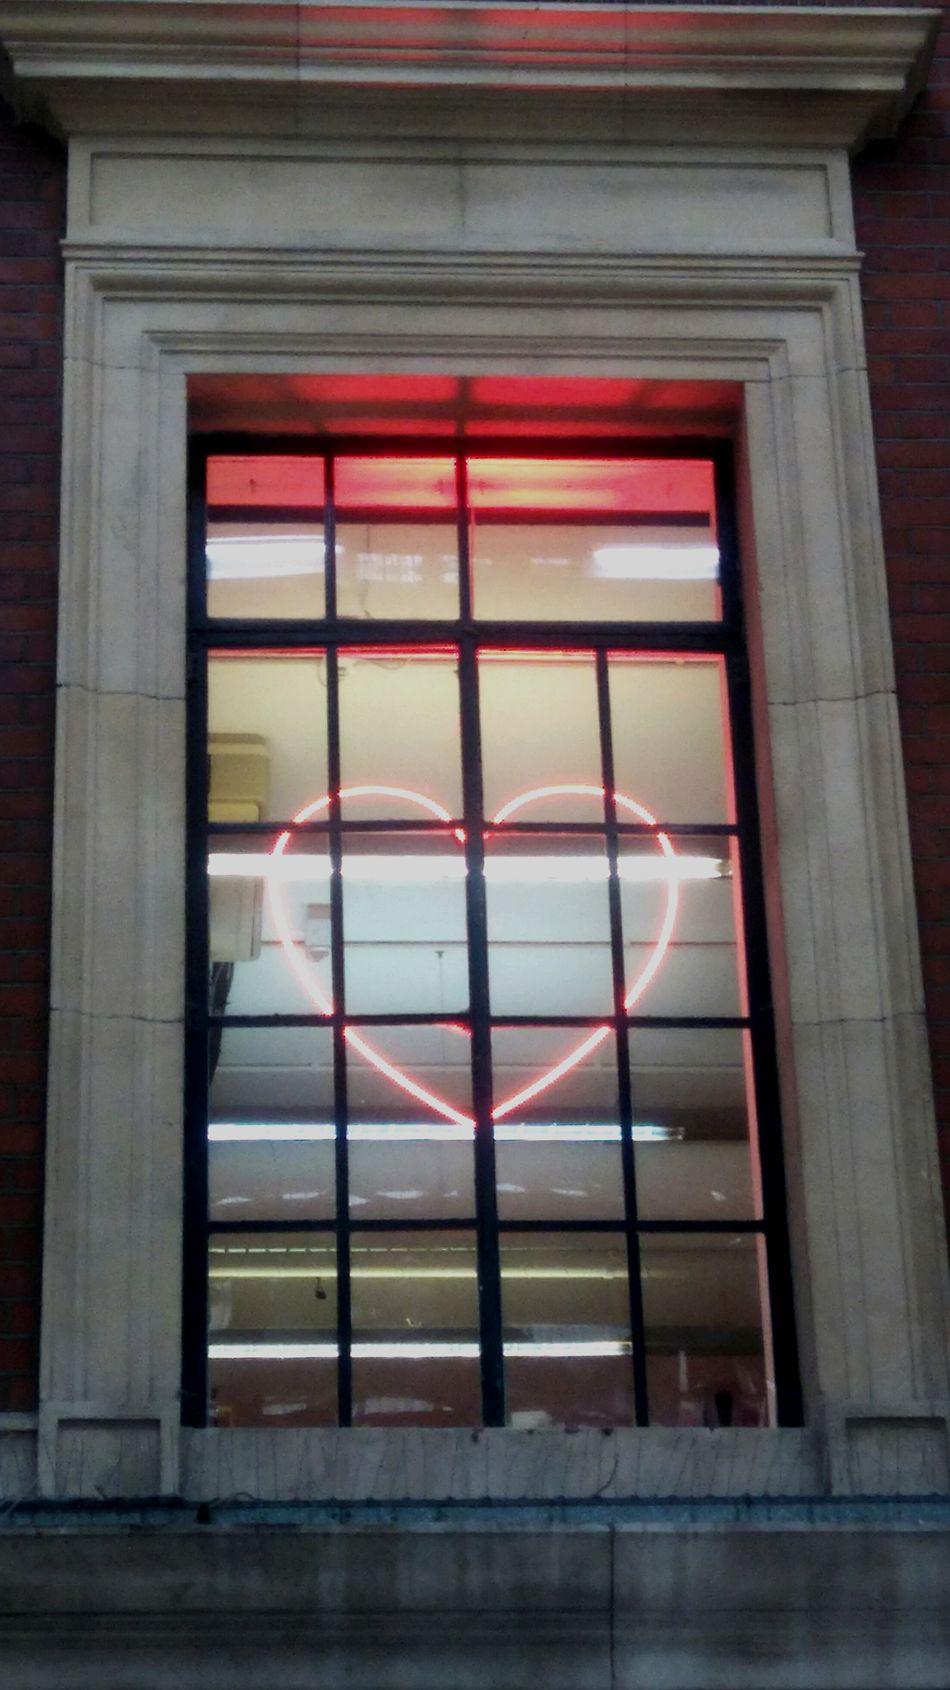 Neon Lights Neonheart Valentine's Day